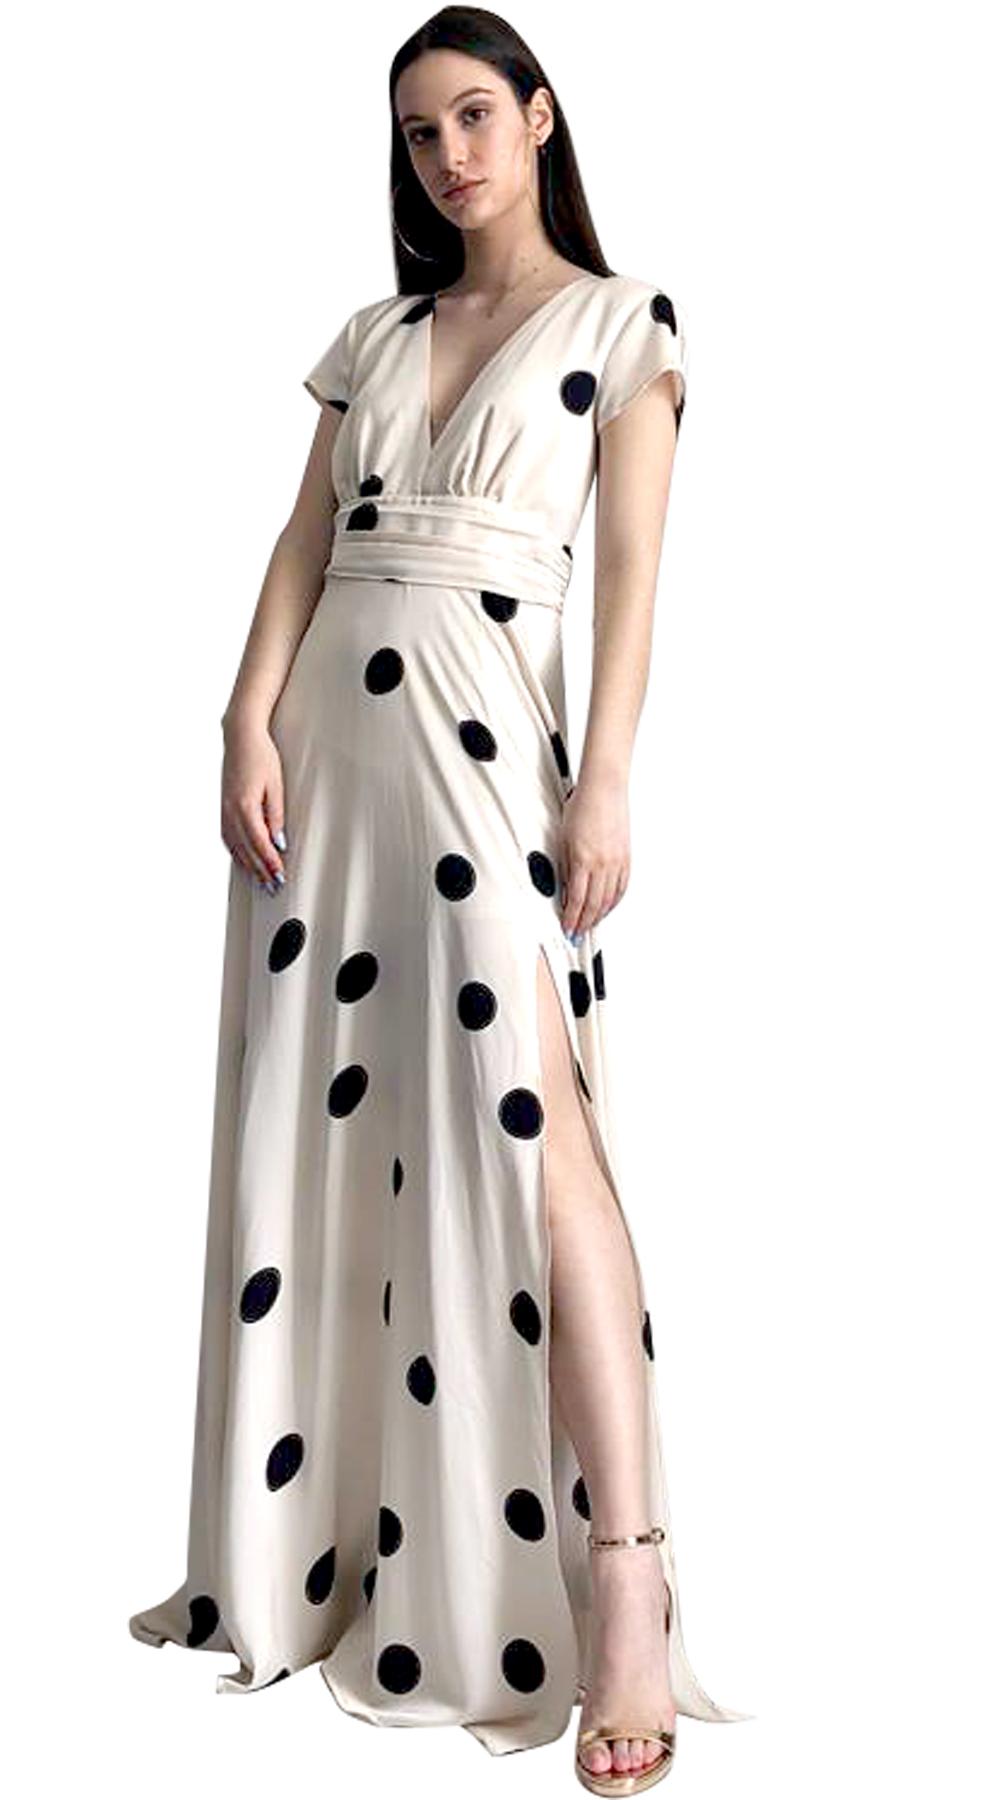 653e8f49ad4e ONLINE - Γυναικεία Φορέματα - Miss Reina